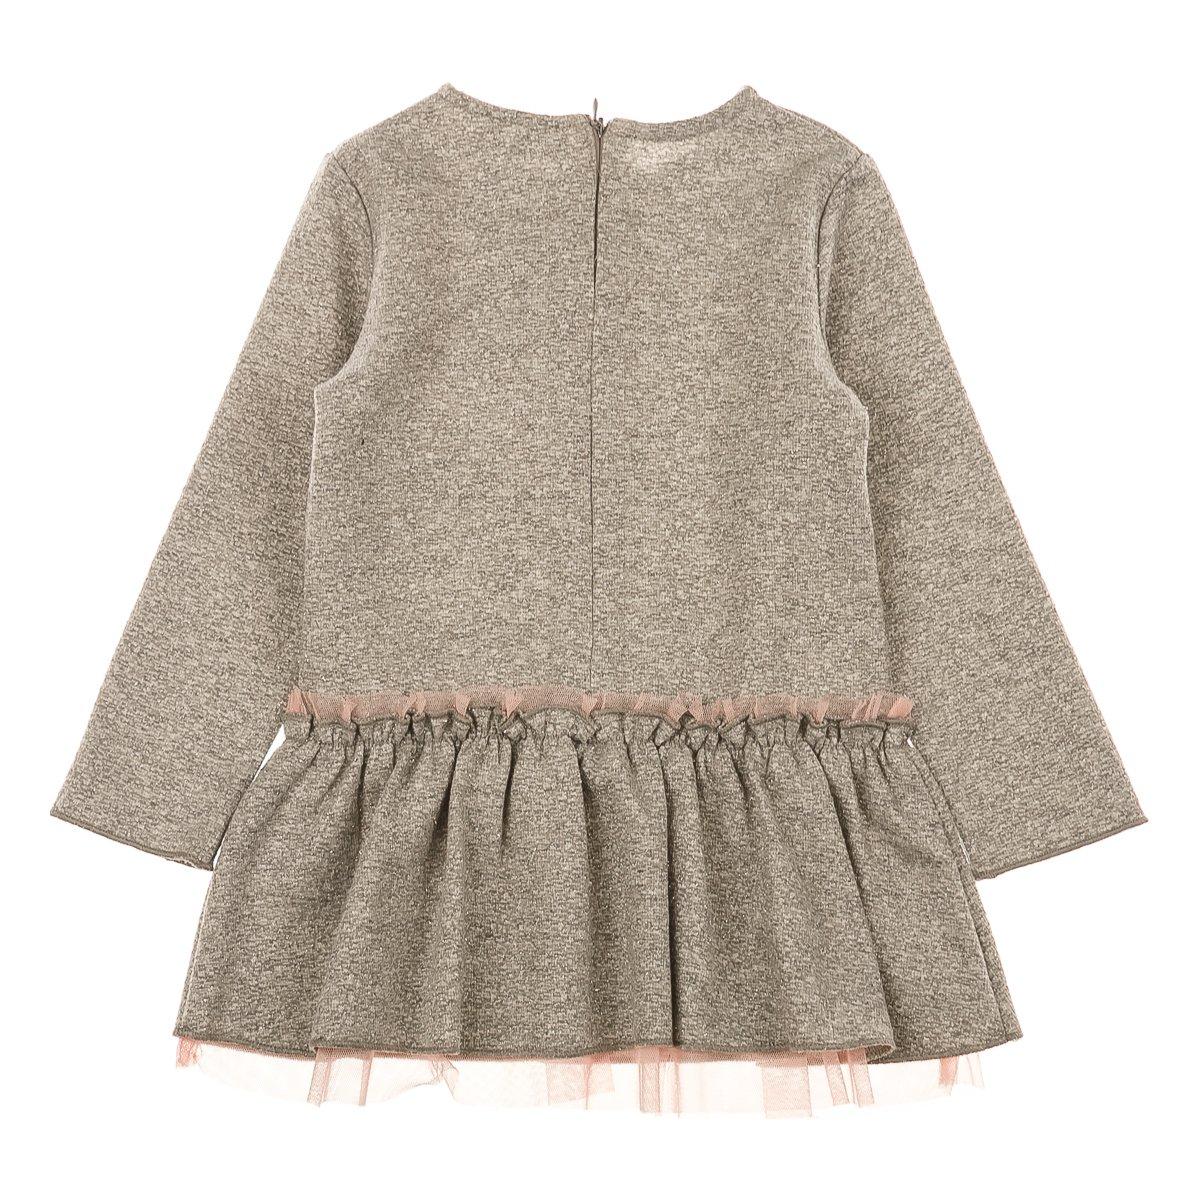 Купить Платья, сарафаны, юбки, Платье BluKids Love&Flowers, р. 86 5479458 ТМ: BluKids, серый